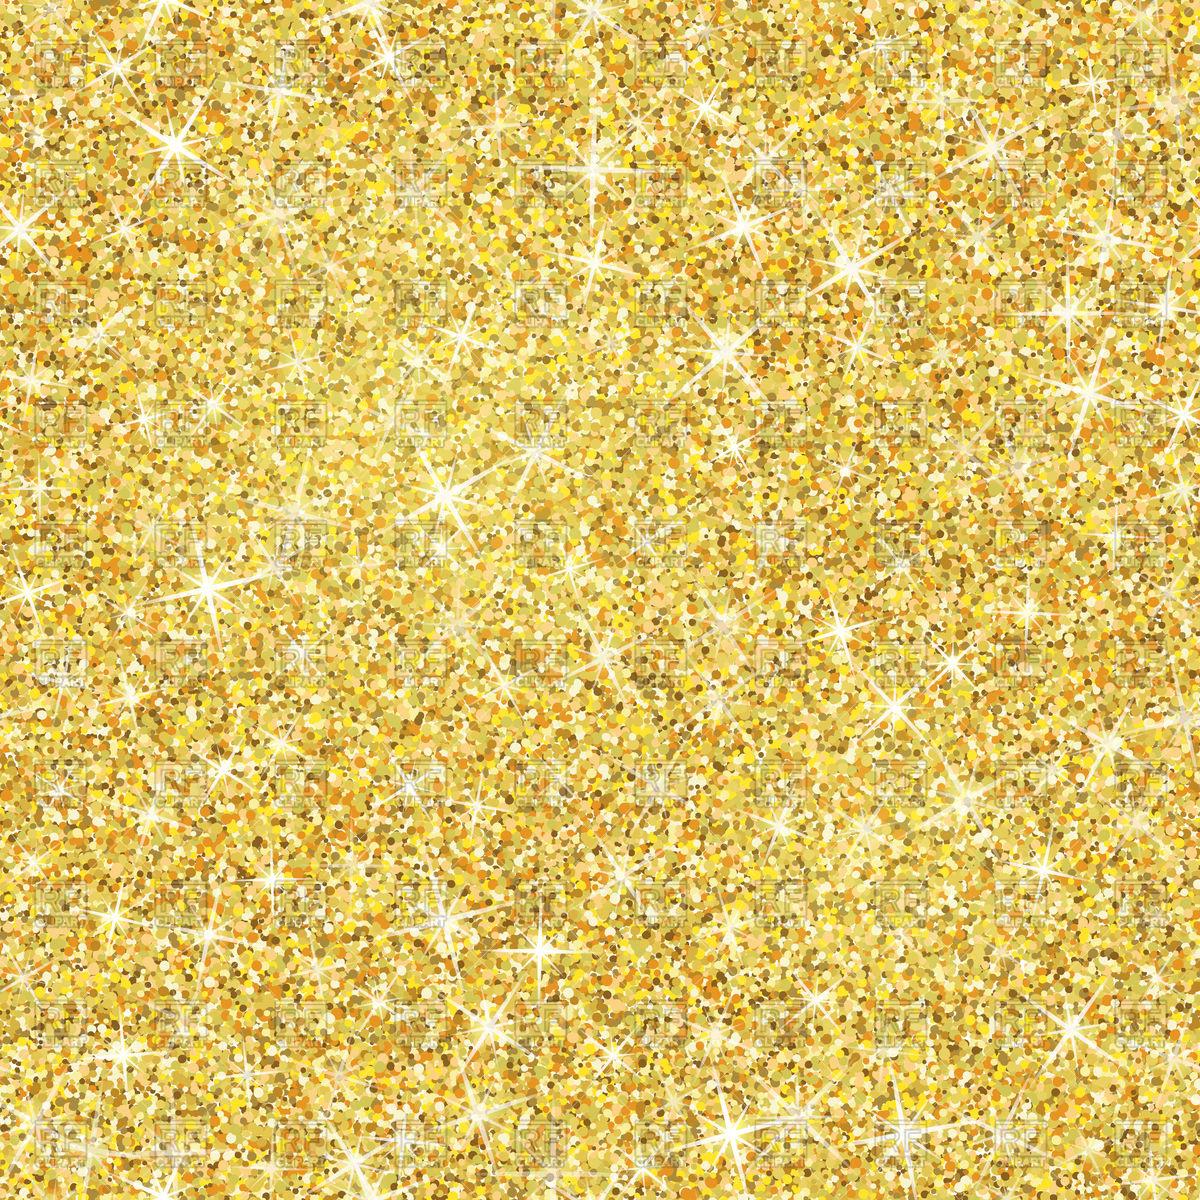 Seamless gold glitter texture Stock Vector Image.